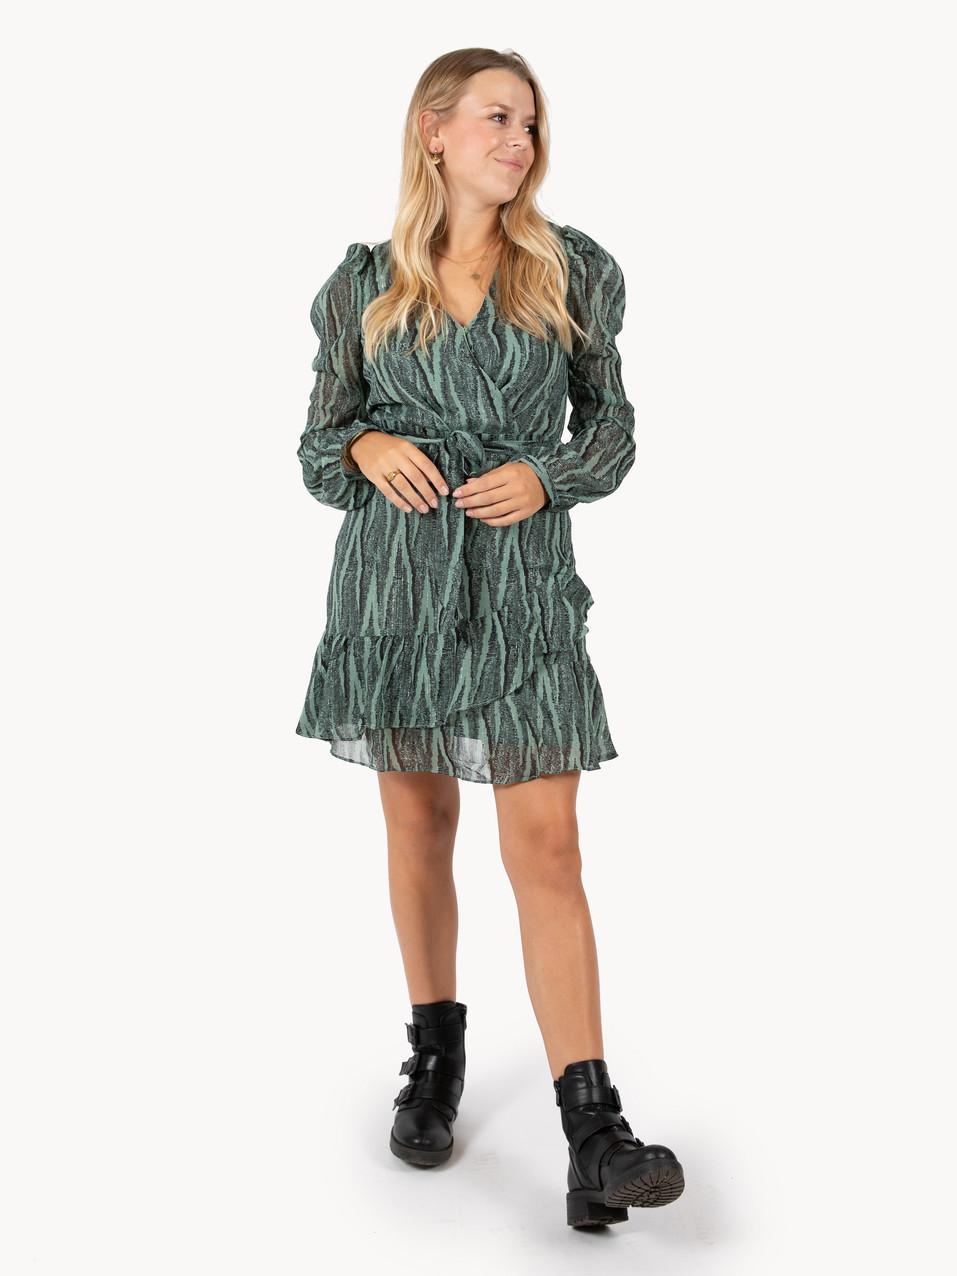 groen-jurkje-1.jpg